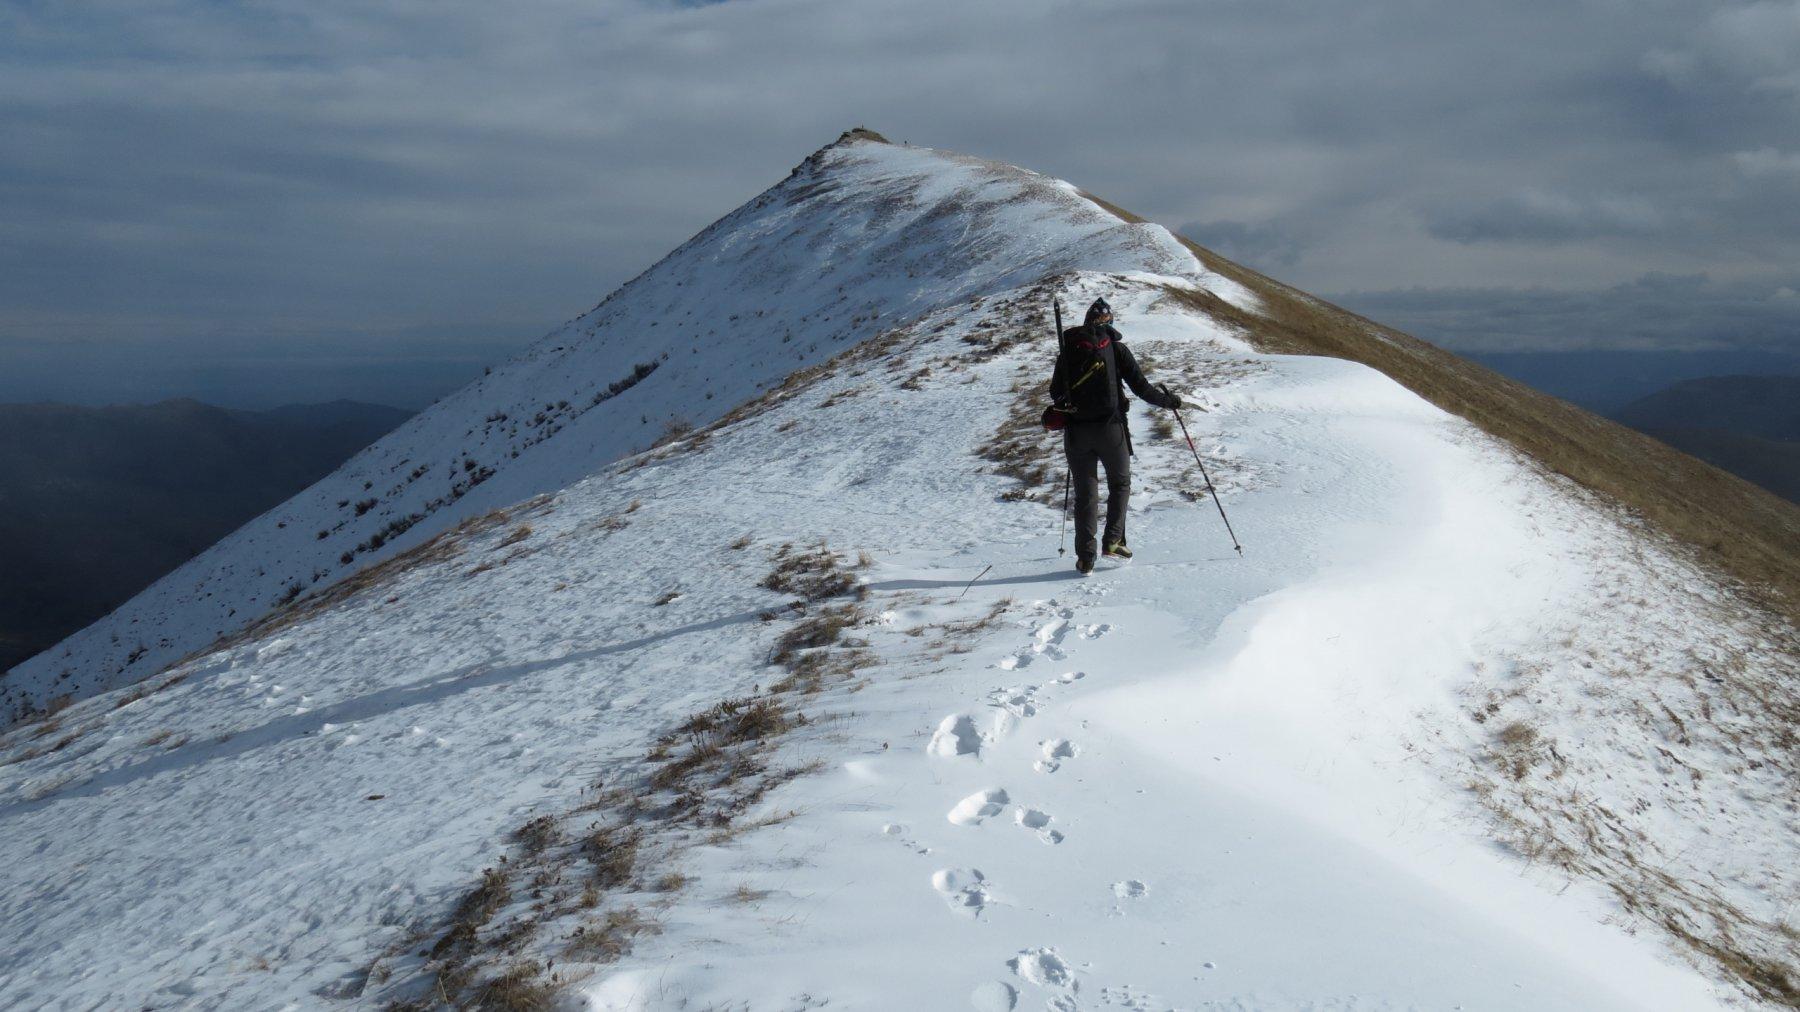 salendo verso la cima del Morfreid (21-11-2015)